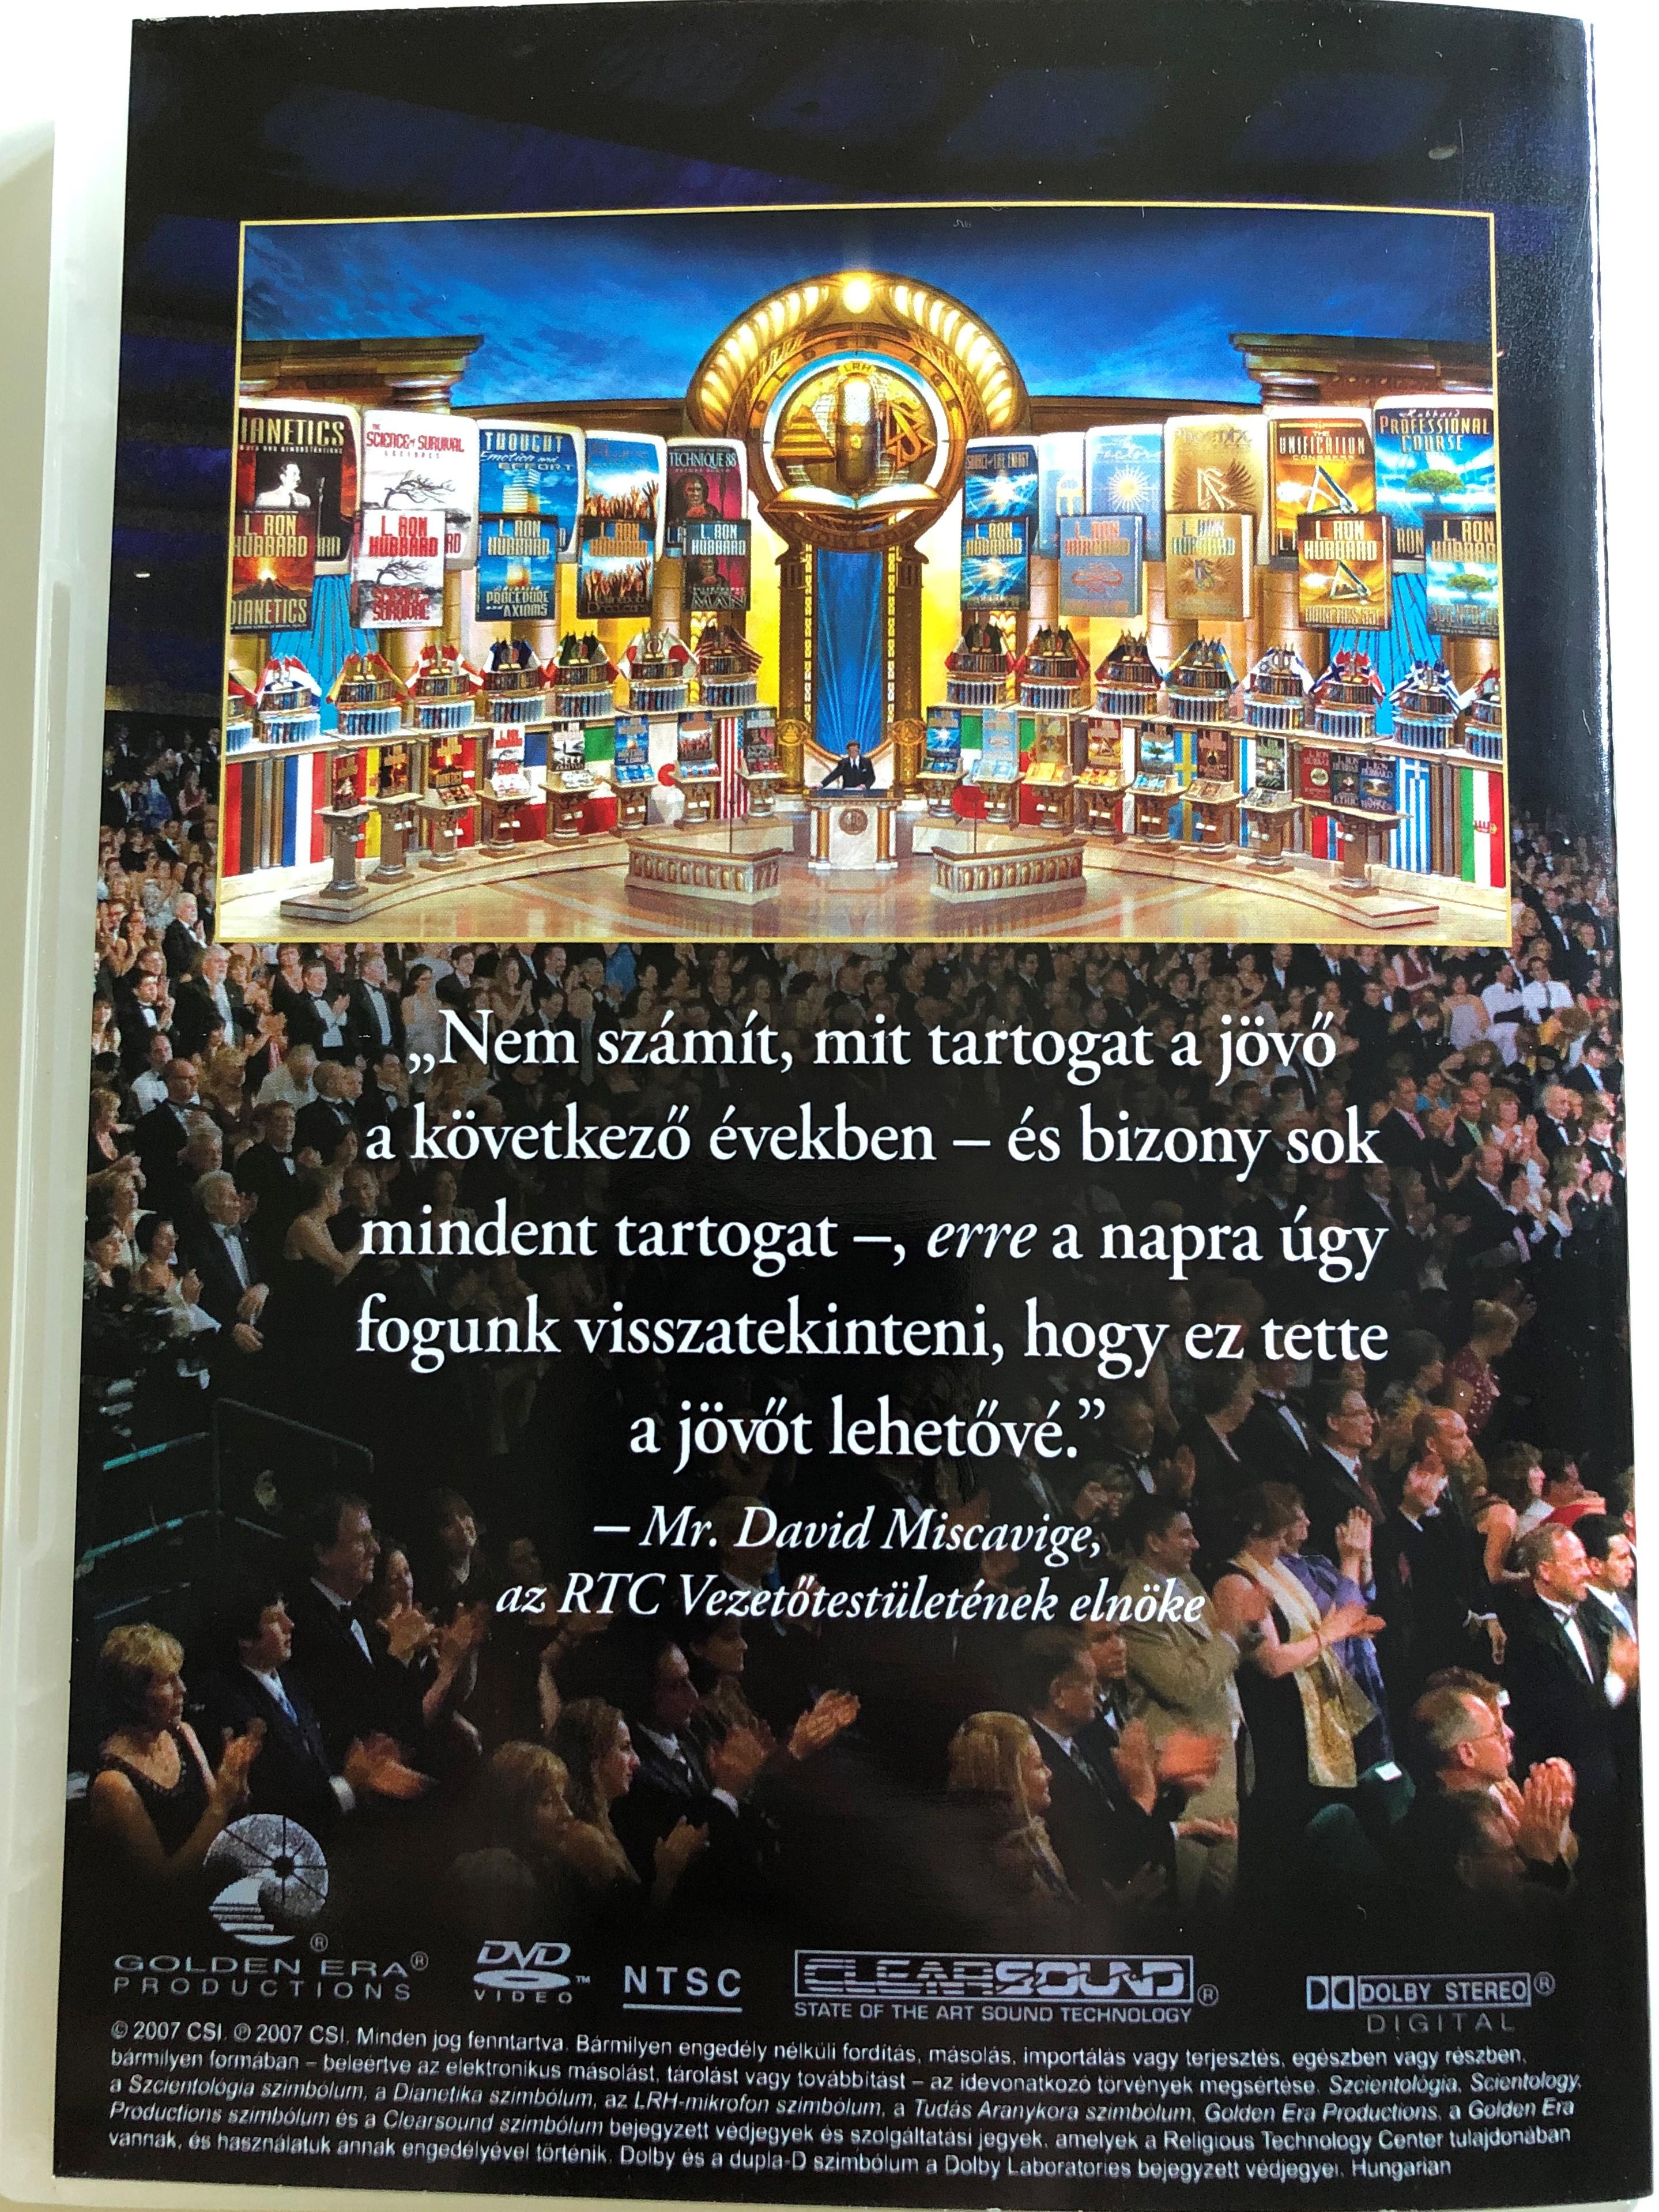 golden-age-of-knowledge-for-eternity-dvd-2007-a-tud-s-aranykora-az-r-kk-val-s-gig-a-rendezv-ny-mely-r-kre-megv-ltoztatta-a-szcientol-gi-t-presented-by-mr.-david-miscavige-l.-ron-hubbard-2-.jpg